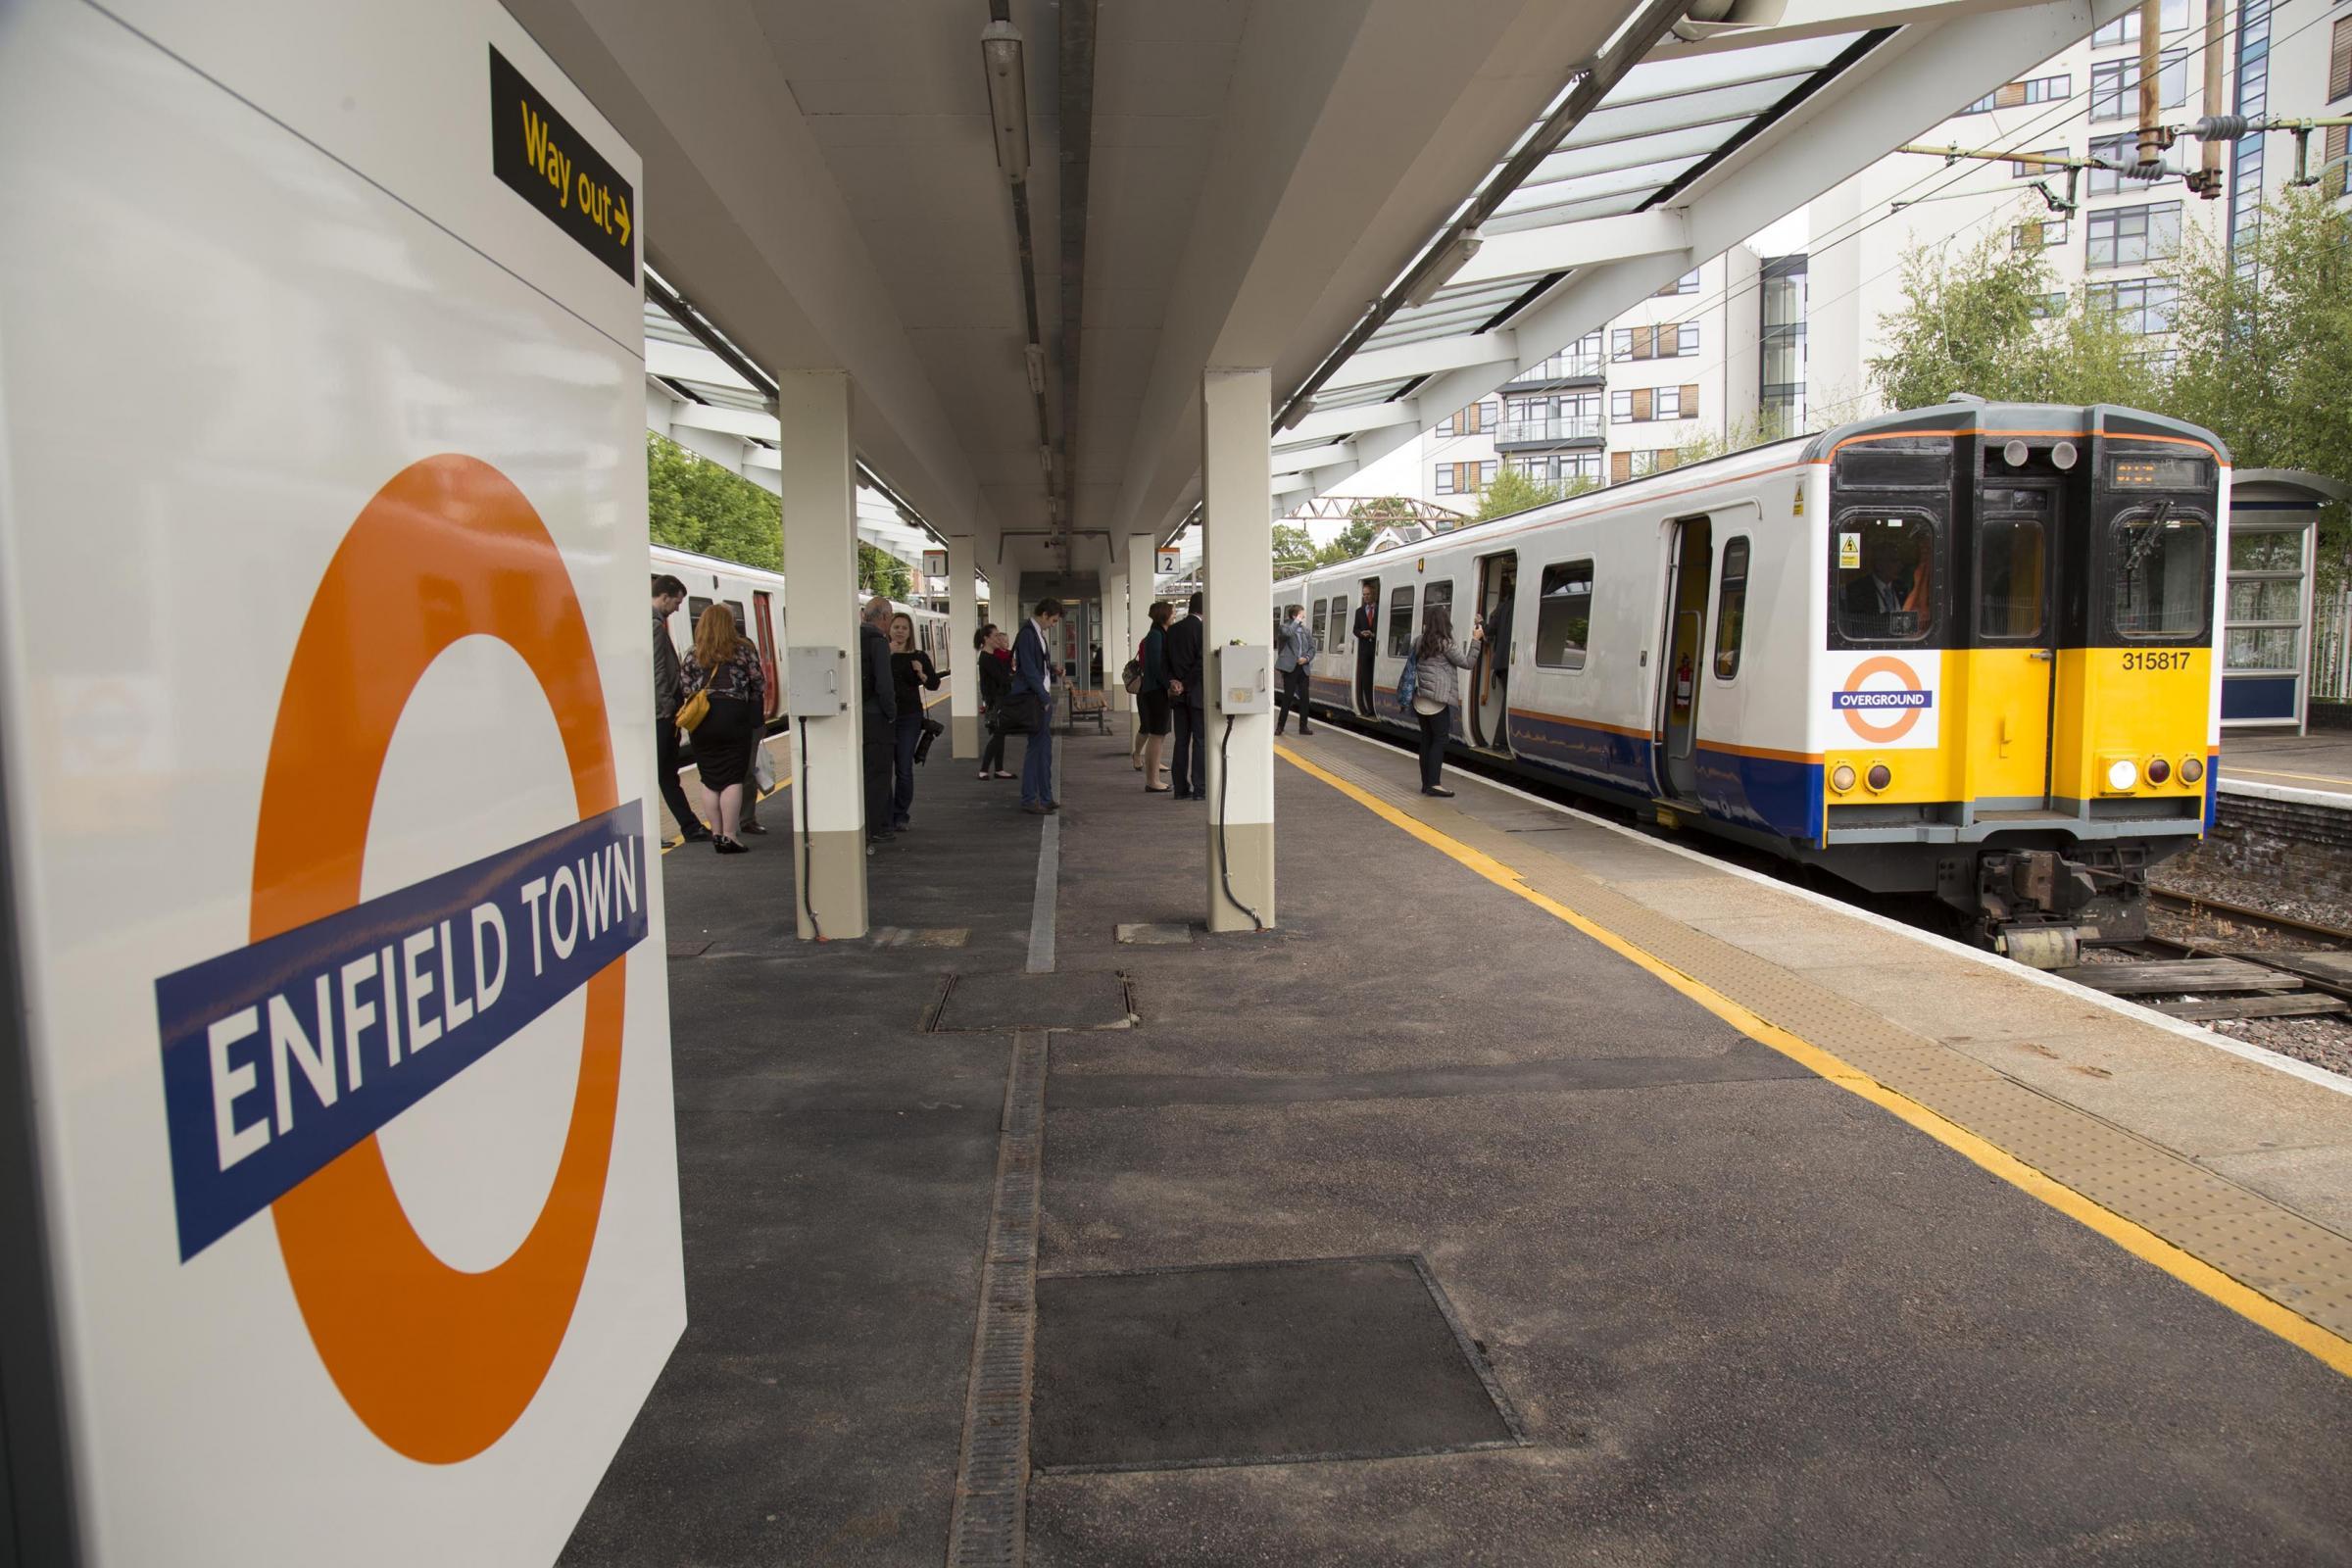 London overground train times homerton sexual health